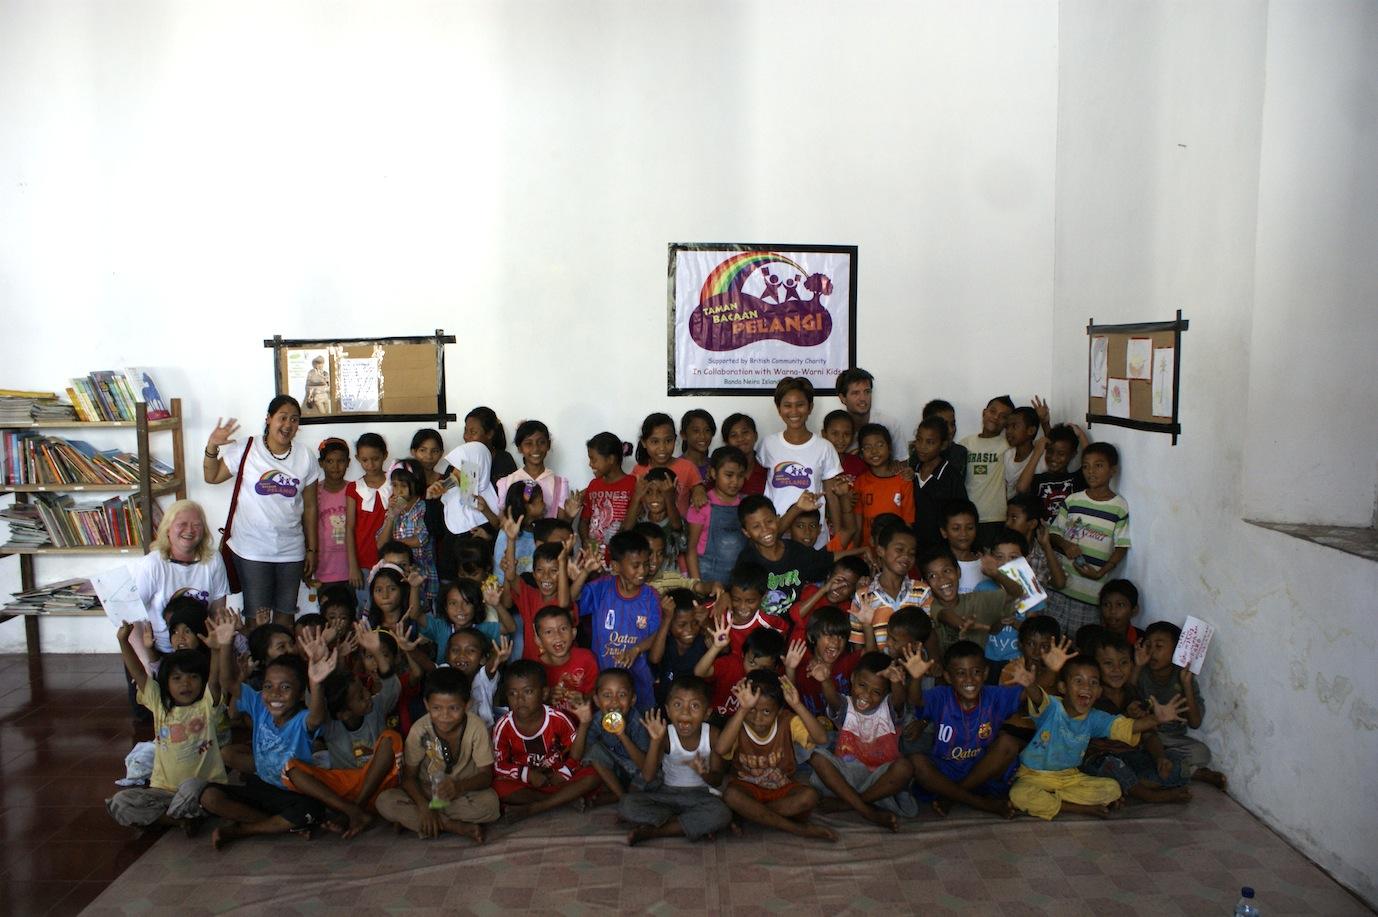 Perpustakaan ke-25: Pulau Banda Neira, Maluku